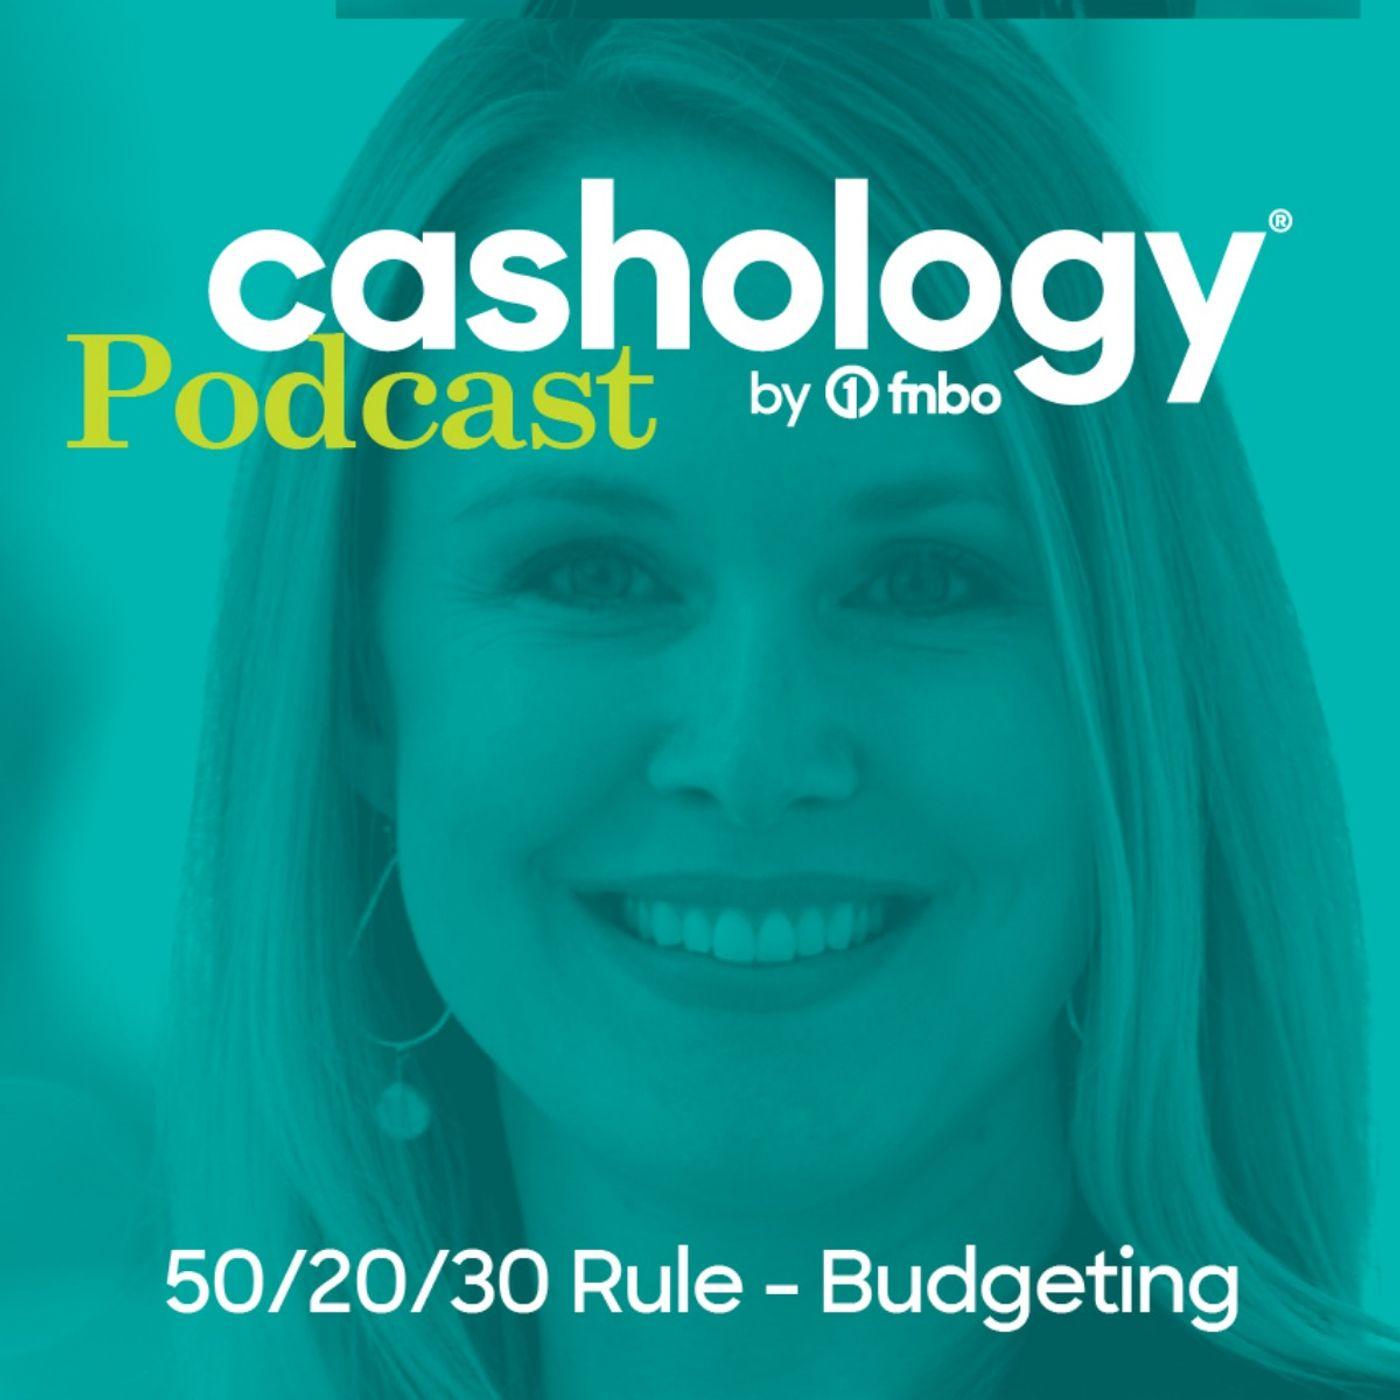 50/20/30 Budgeting